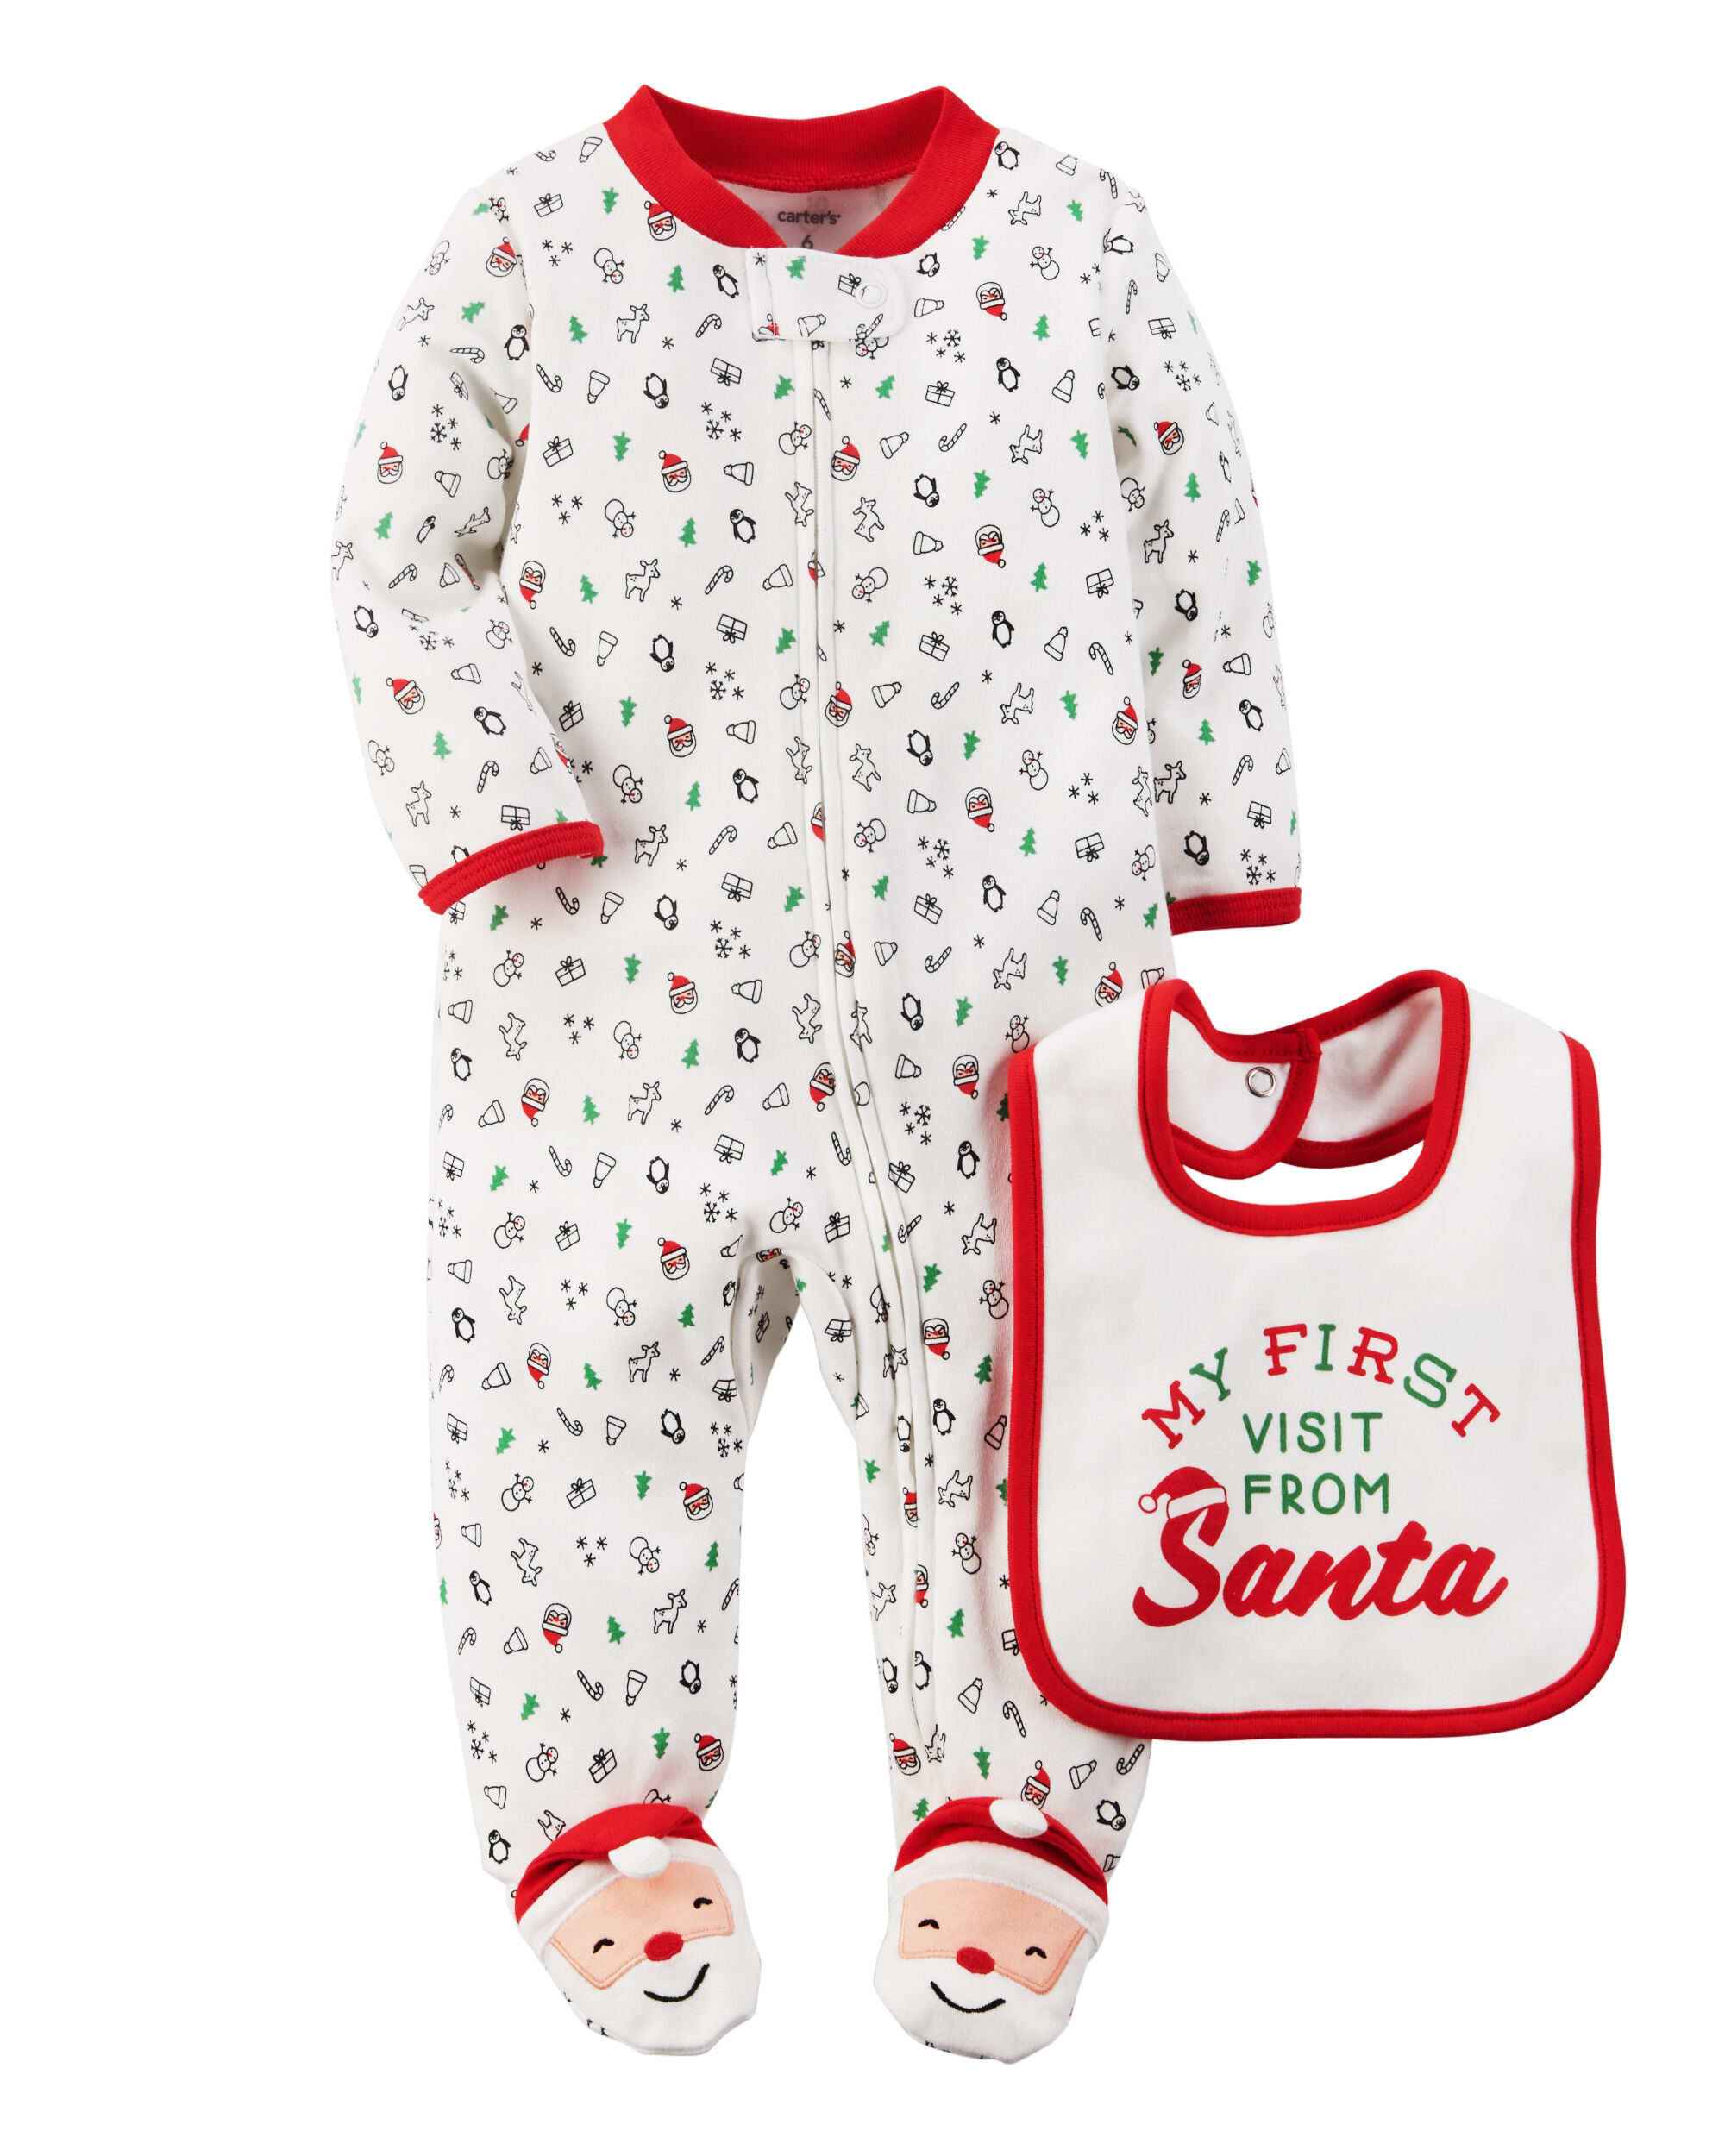 Carters Baby Toddler Girls 2 Pack Fleece Footed Pajama Sleep And